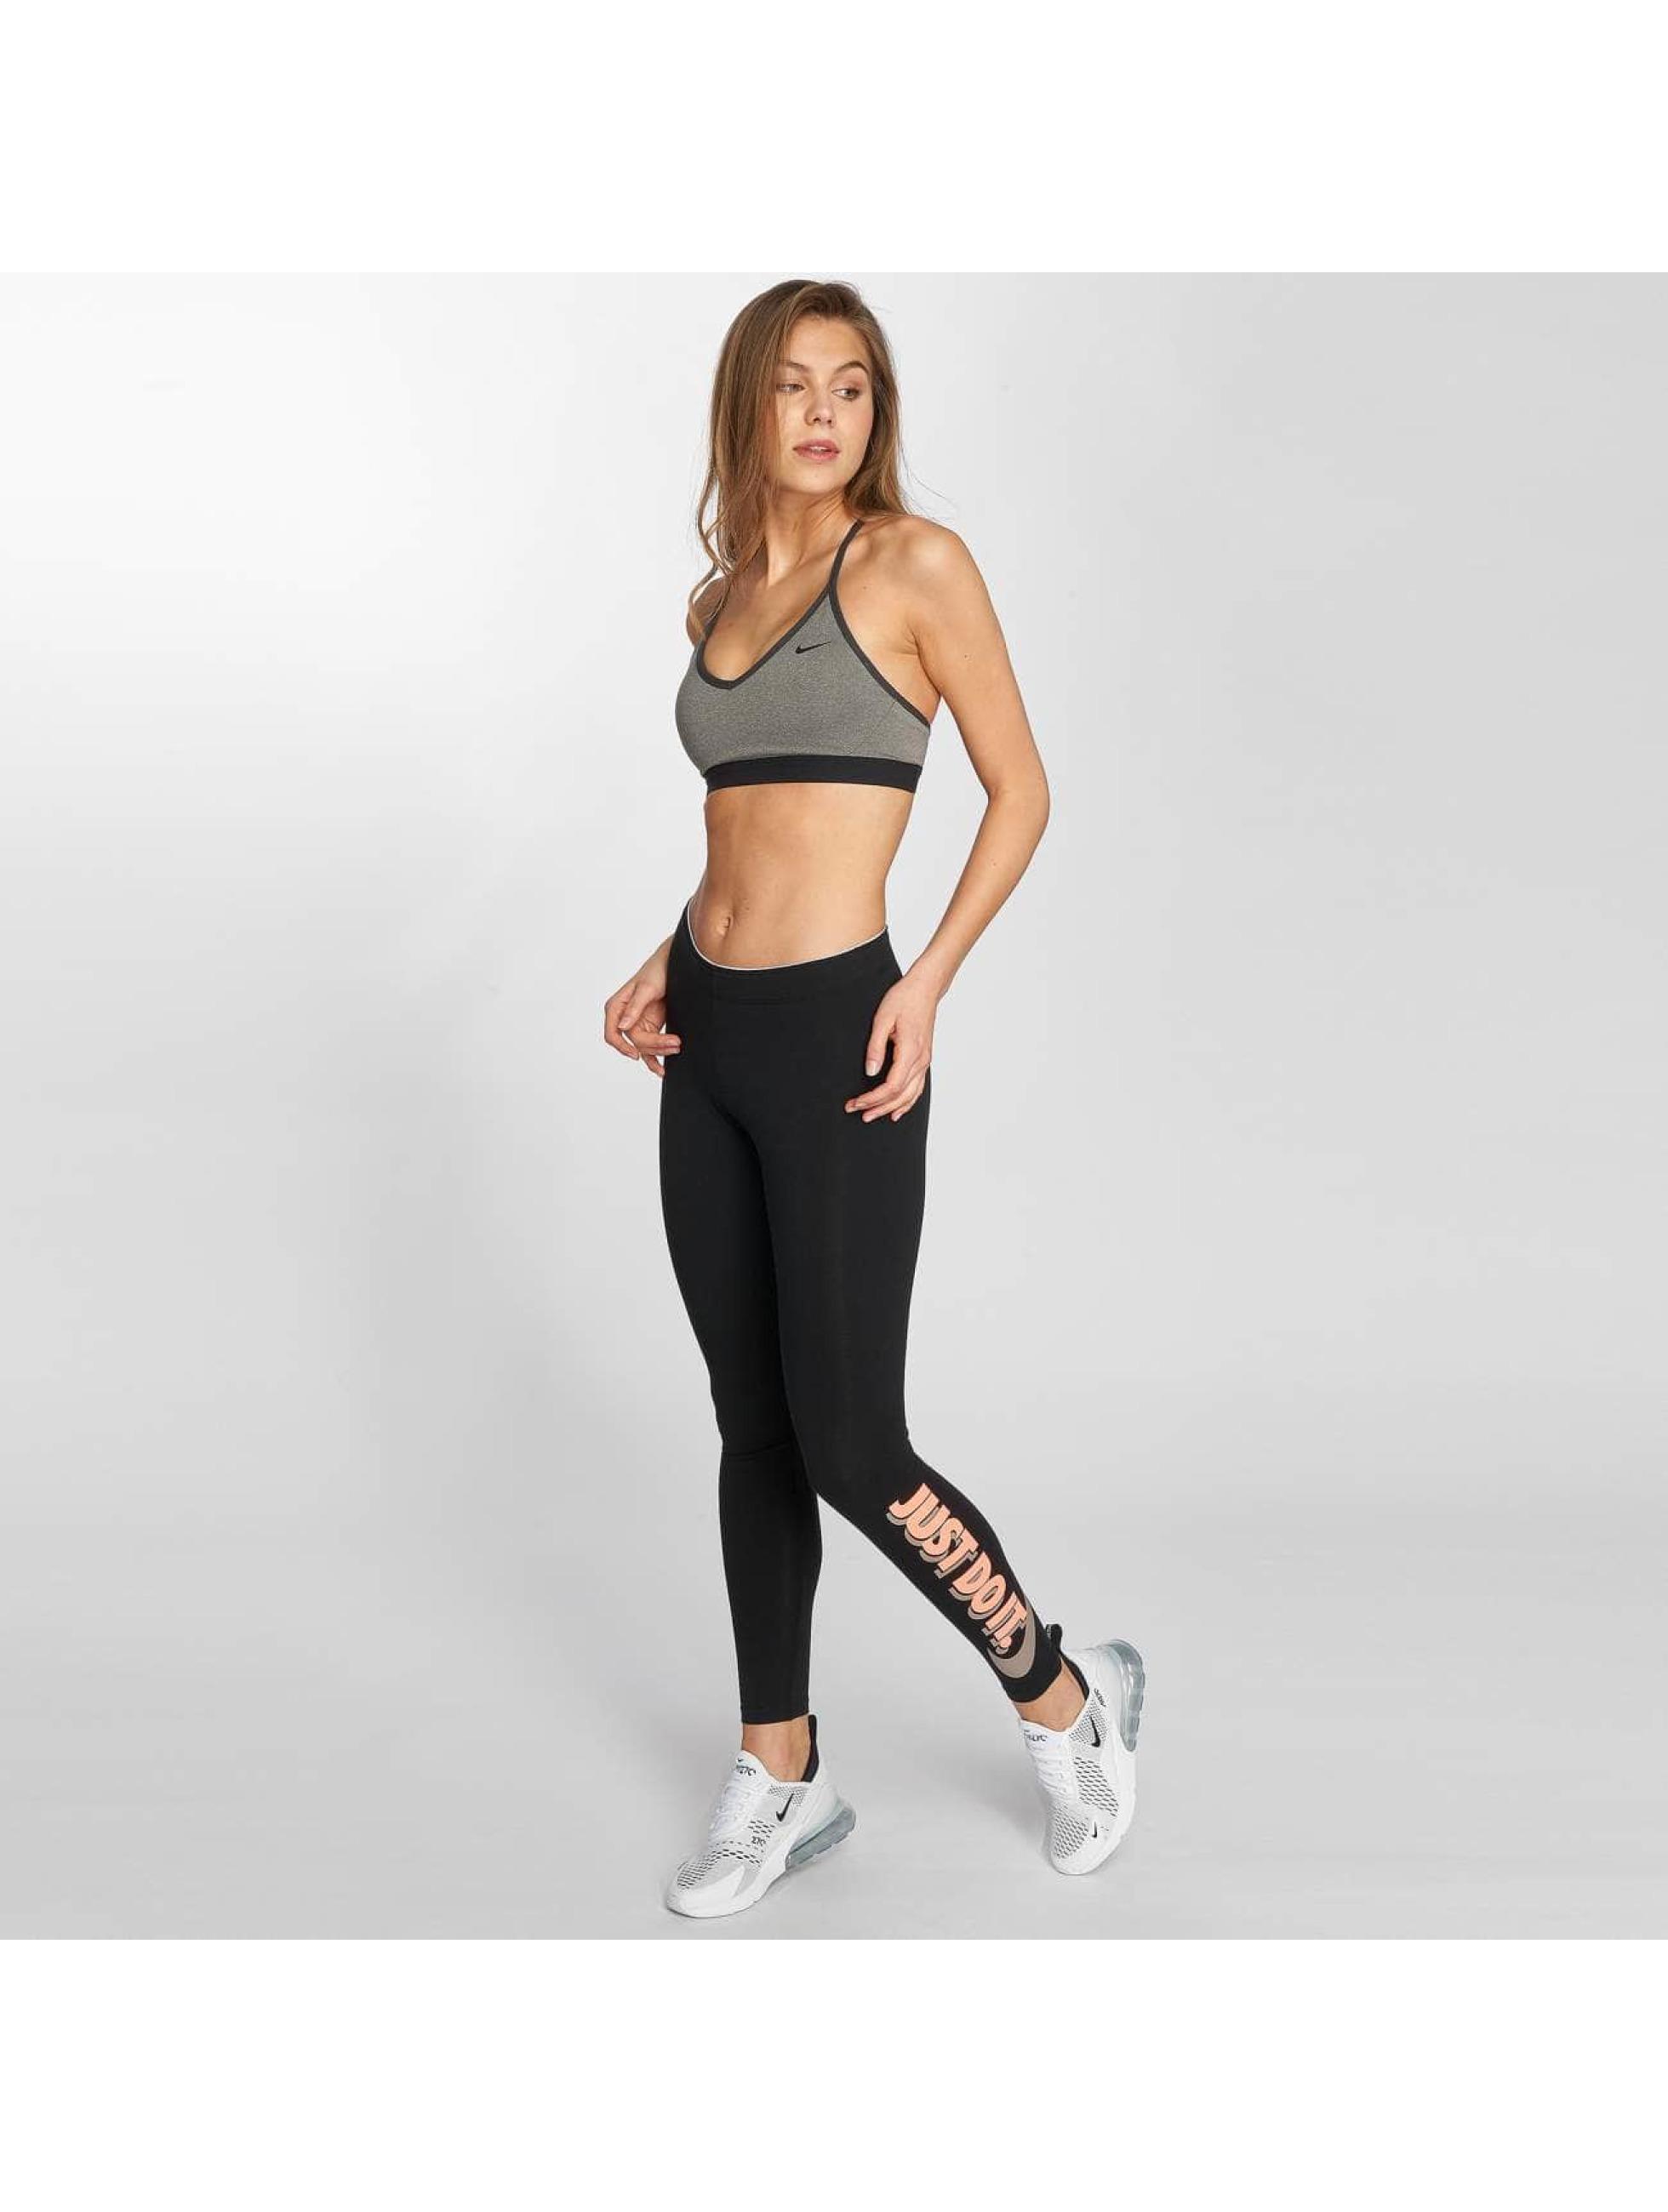 Nike Performance Sujetador desportivo Indy gris